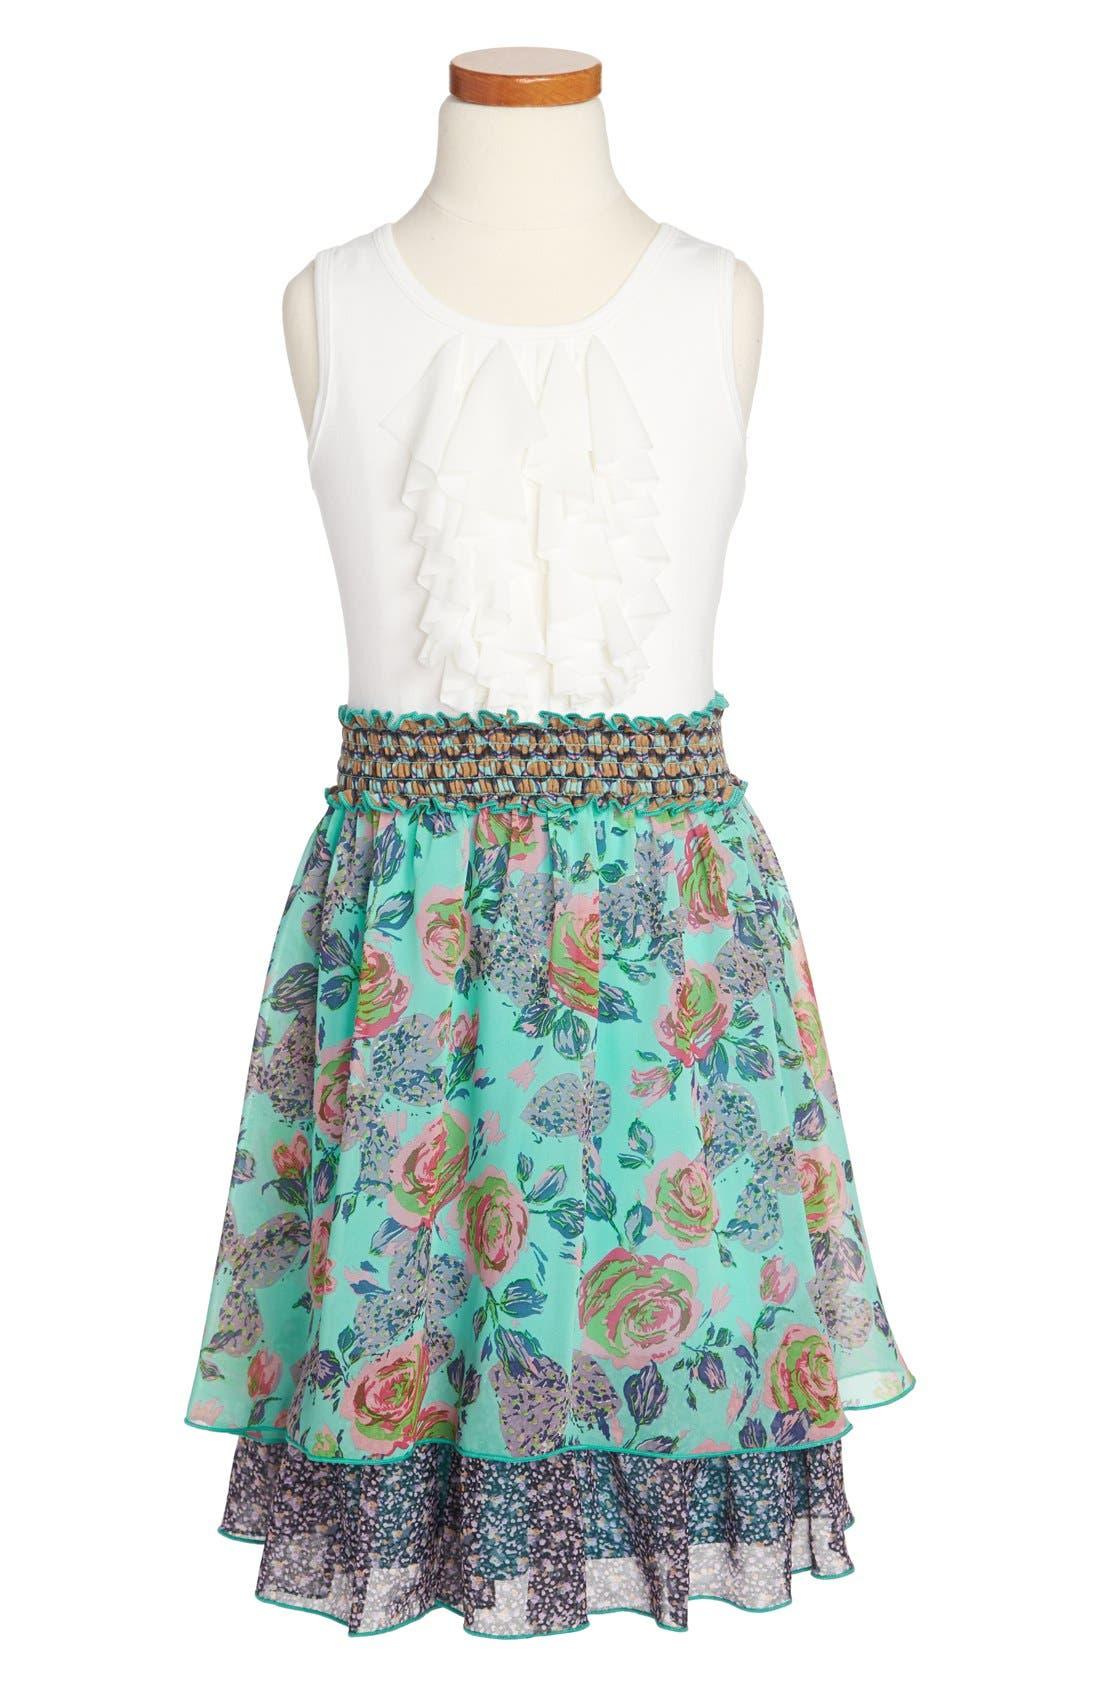 Main Image - Truly Me 'Media' Smocked Waist Dress (Big Girls)